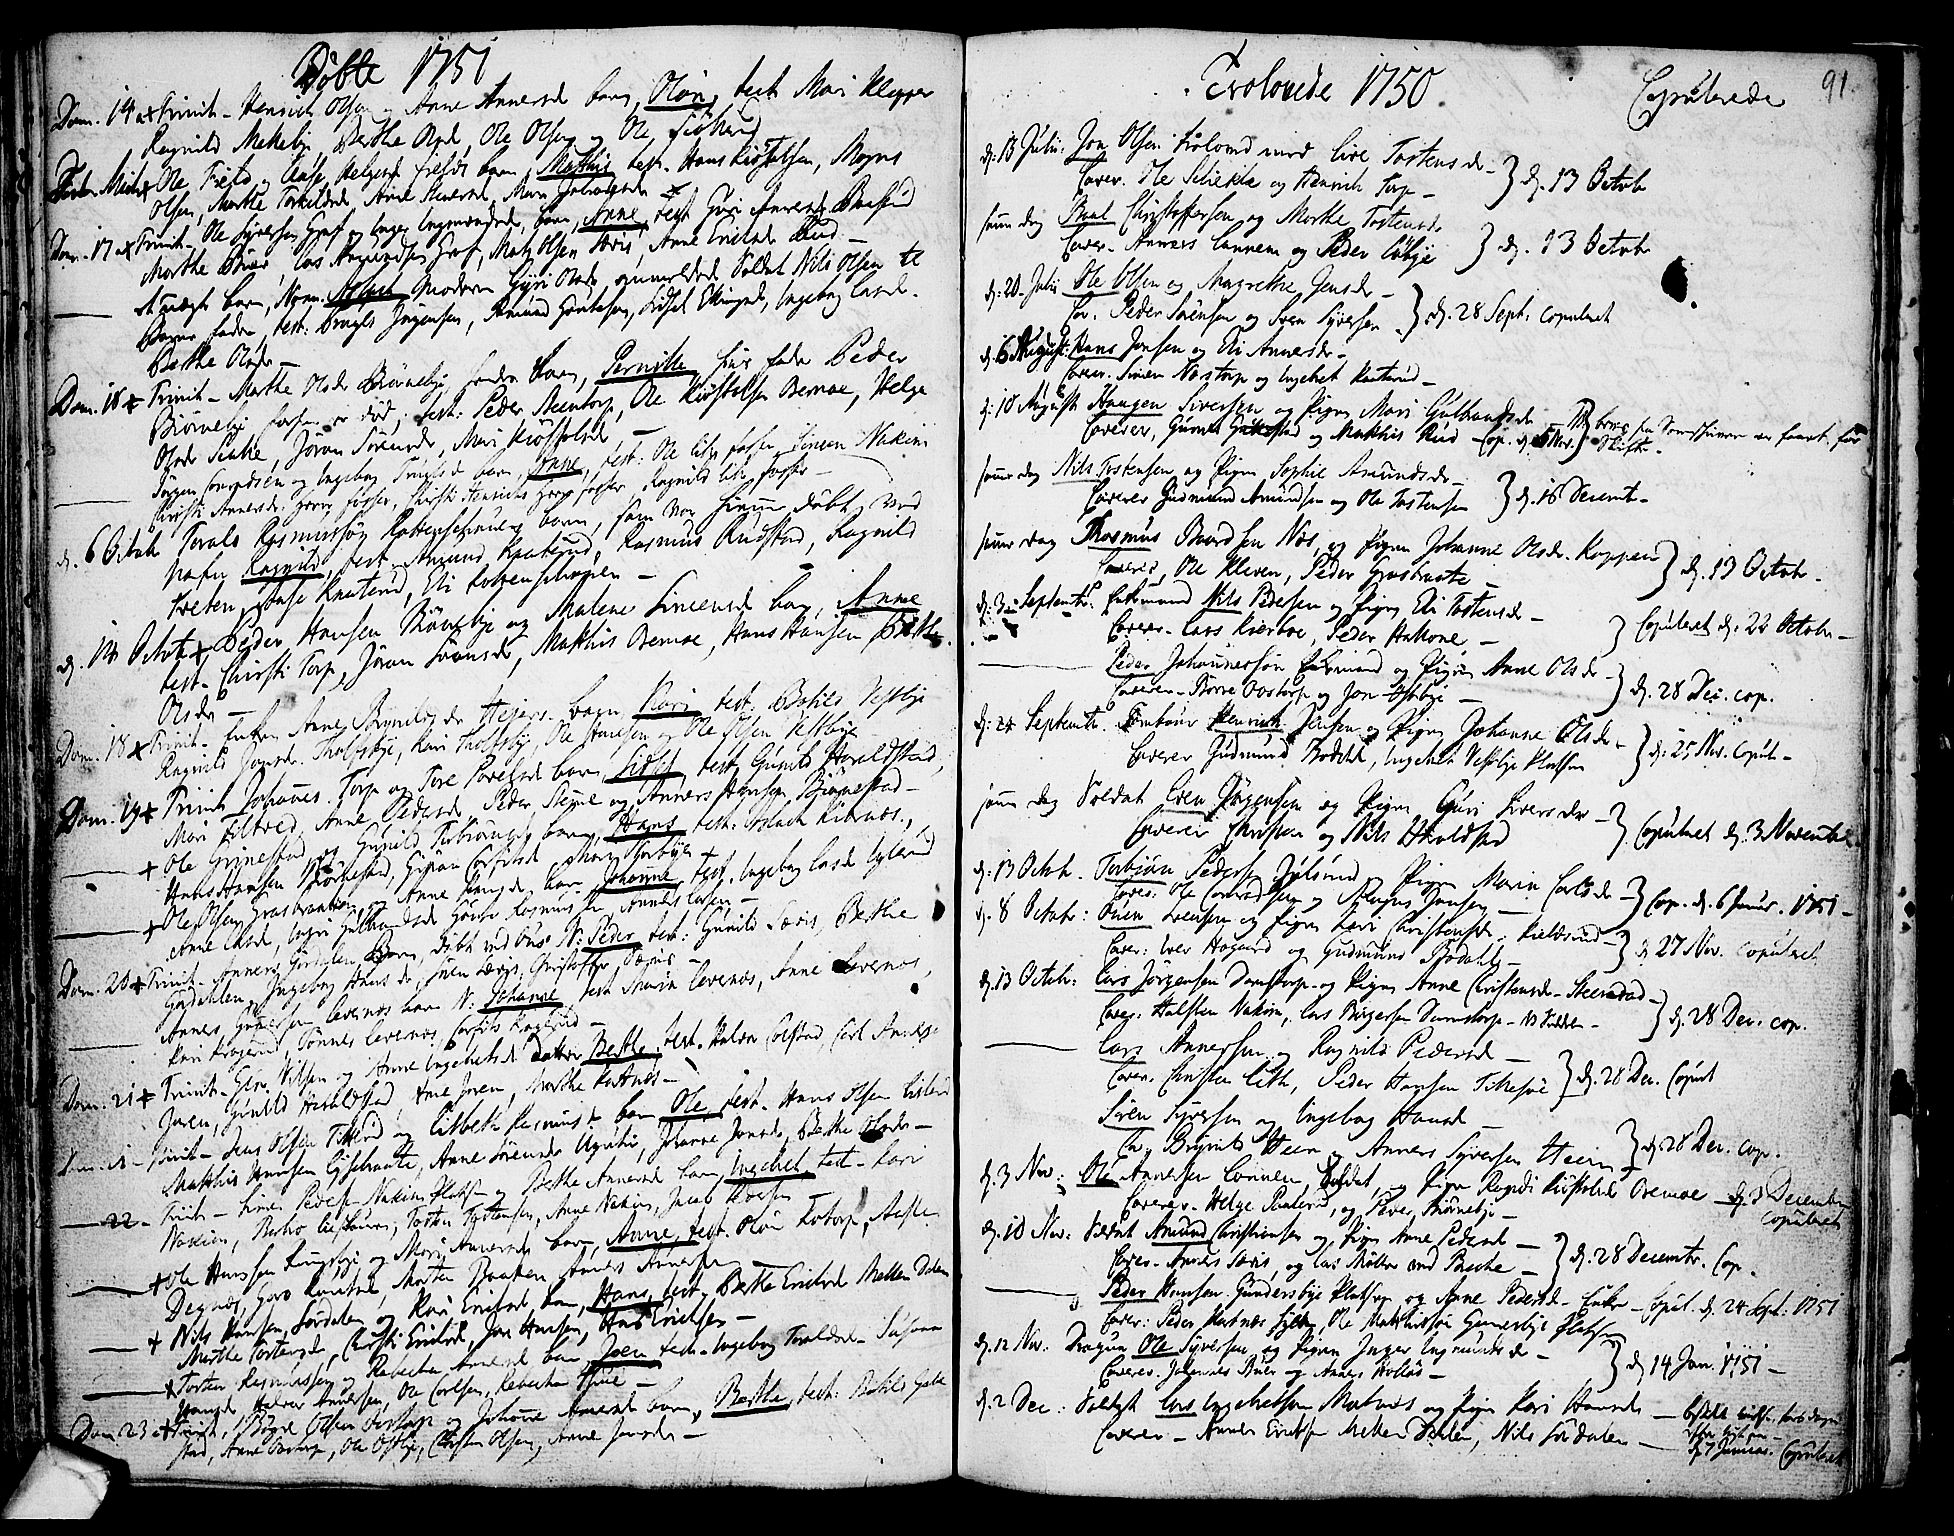 SAO, Rakkestad prestekontor Kirkebøker, F/Fa/L0002: Ministerialbok nr. I 2, 1741-1751, s. 91